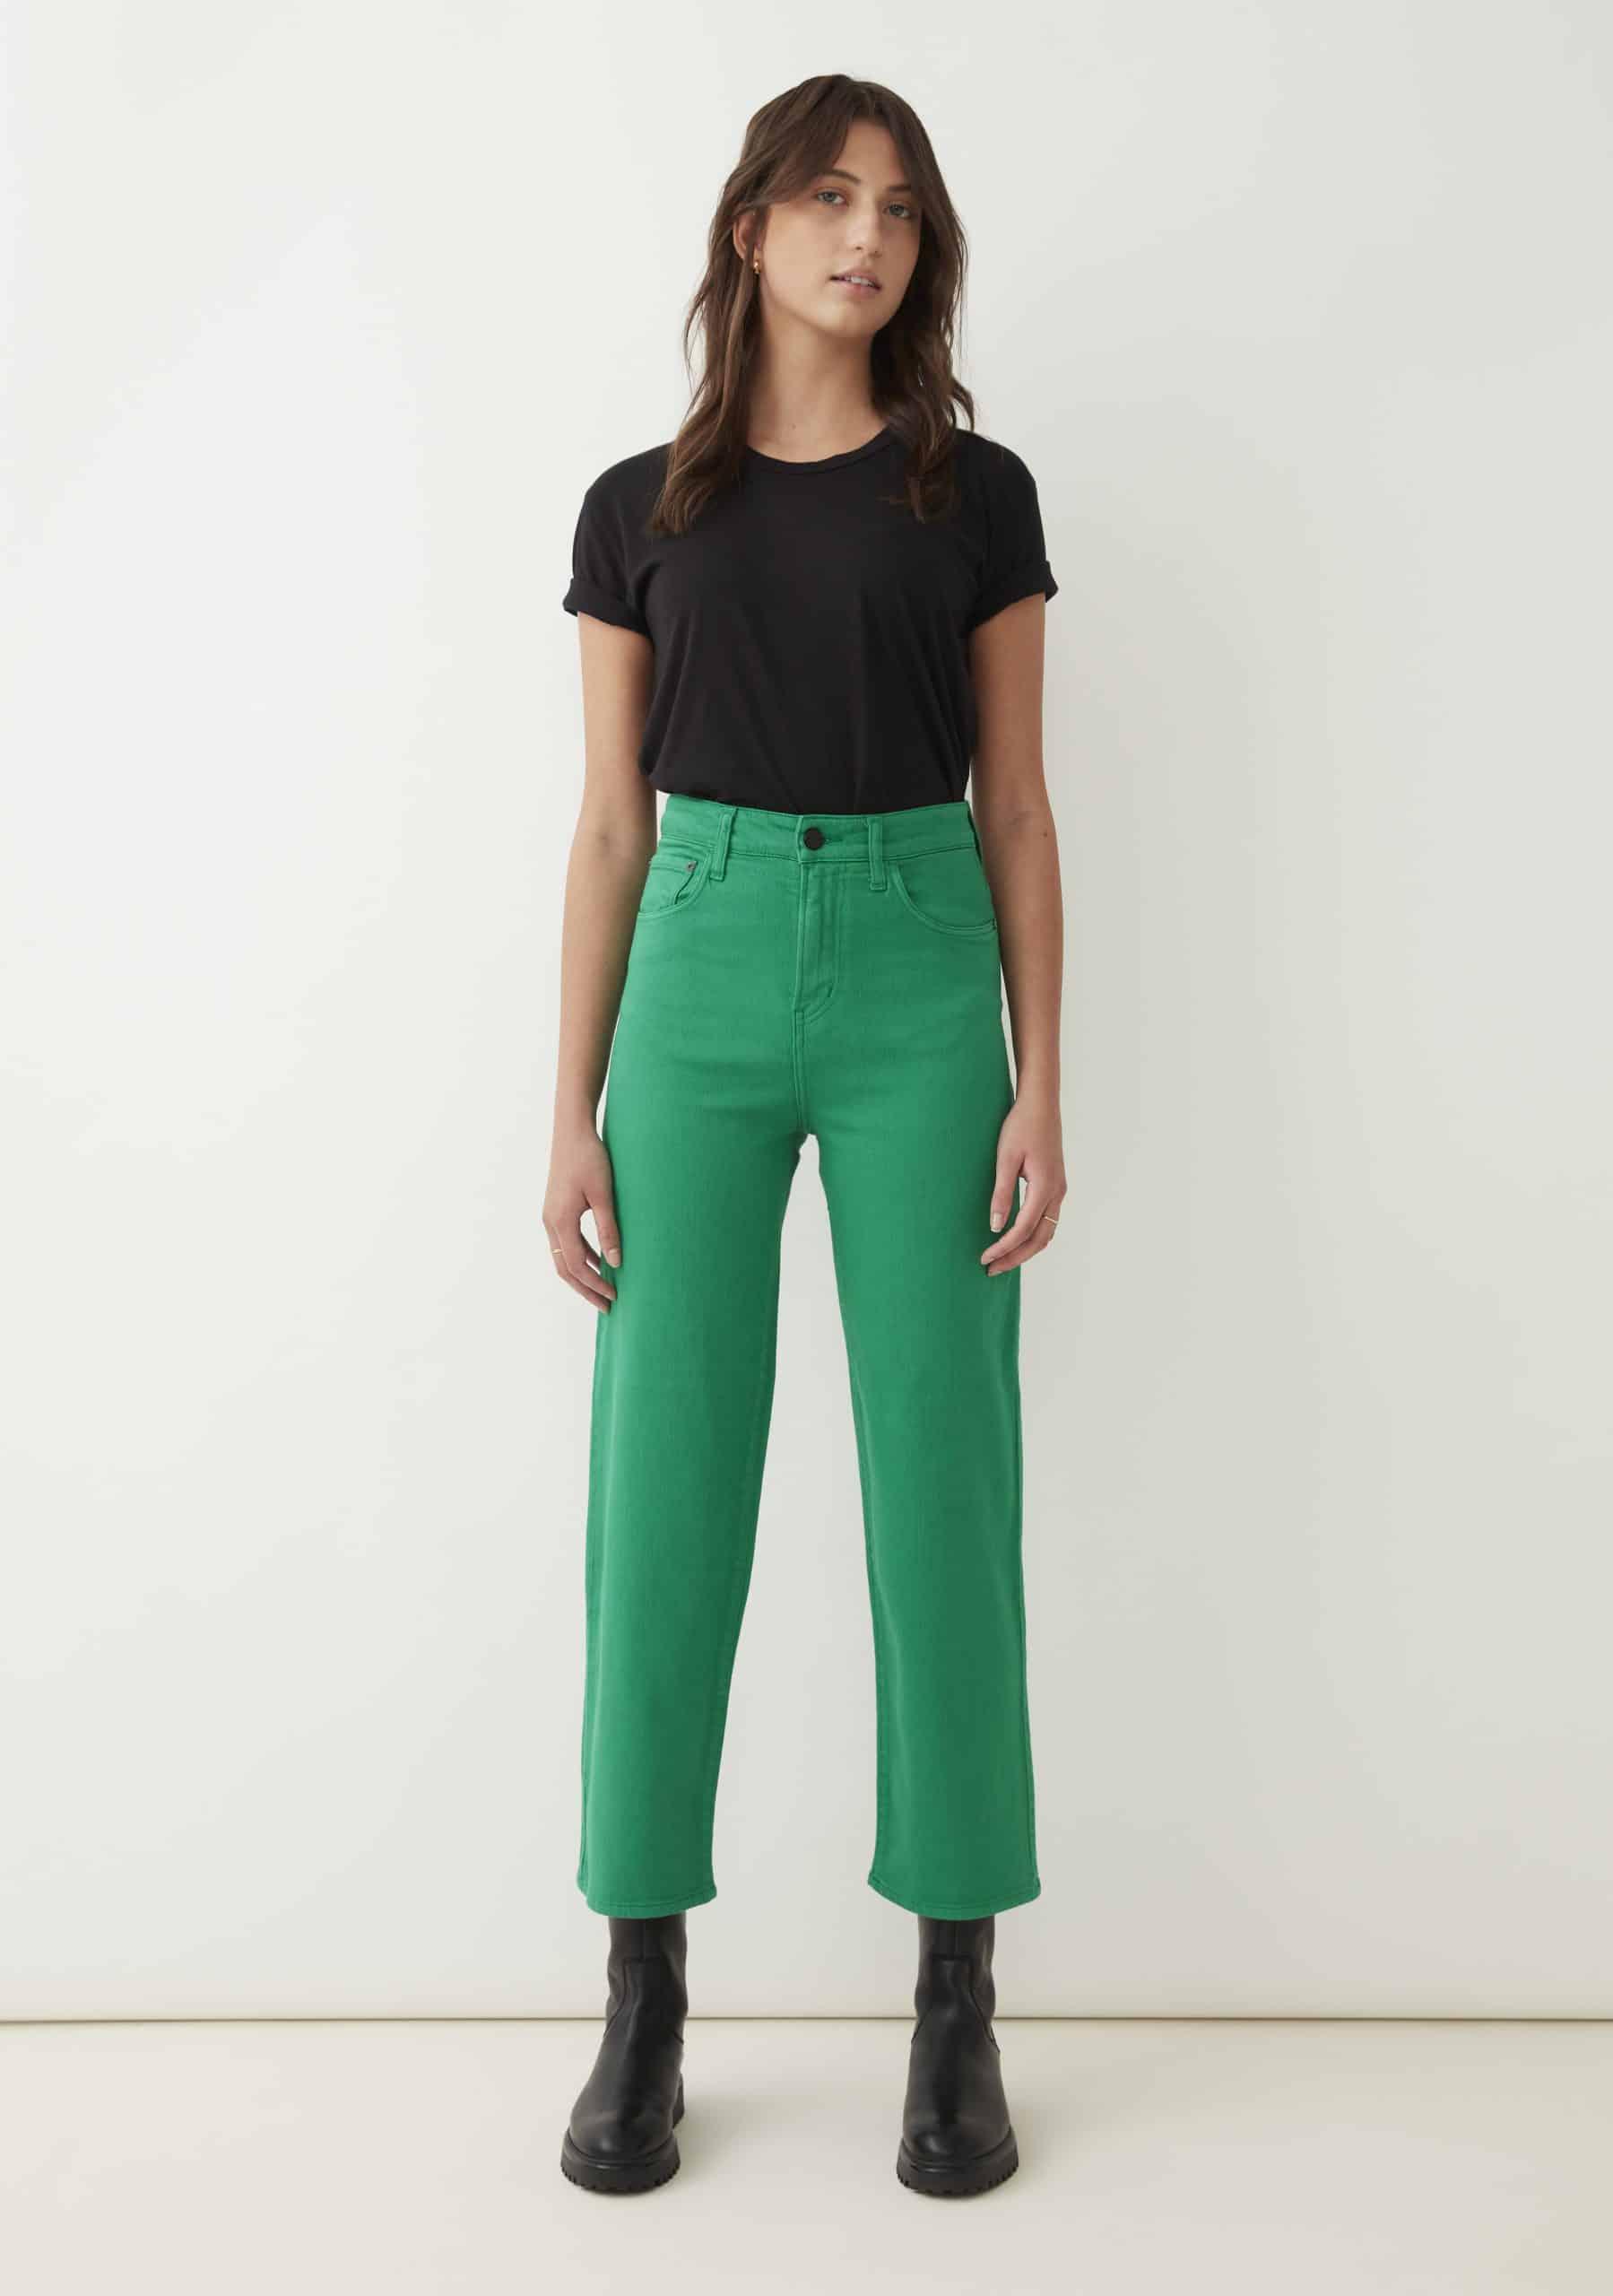 denimsmith emerald jeans